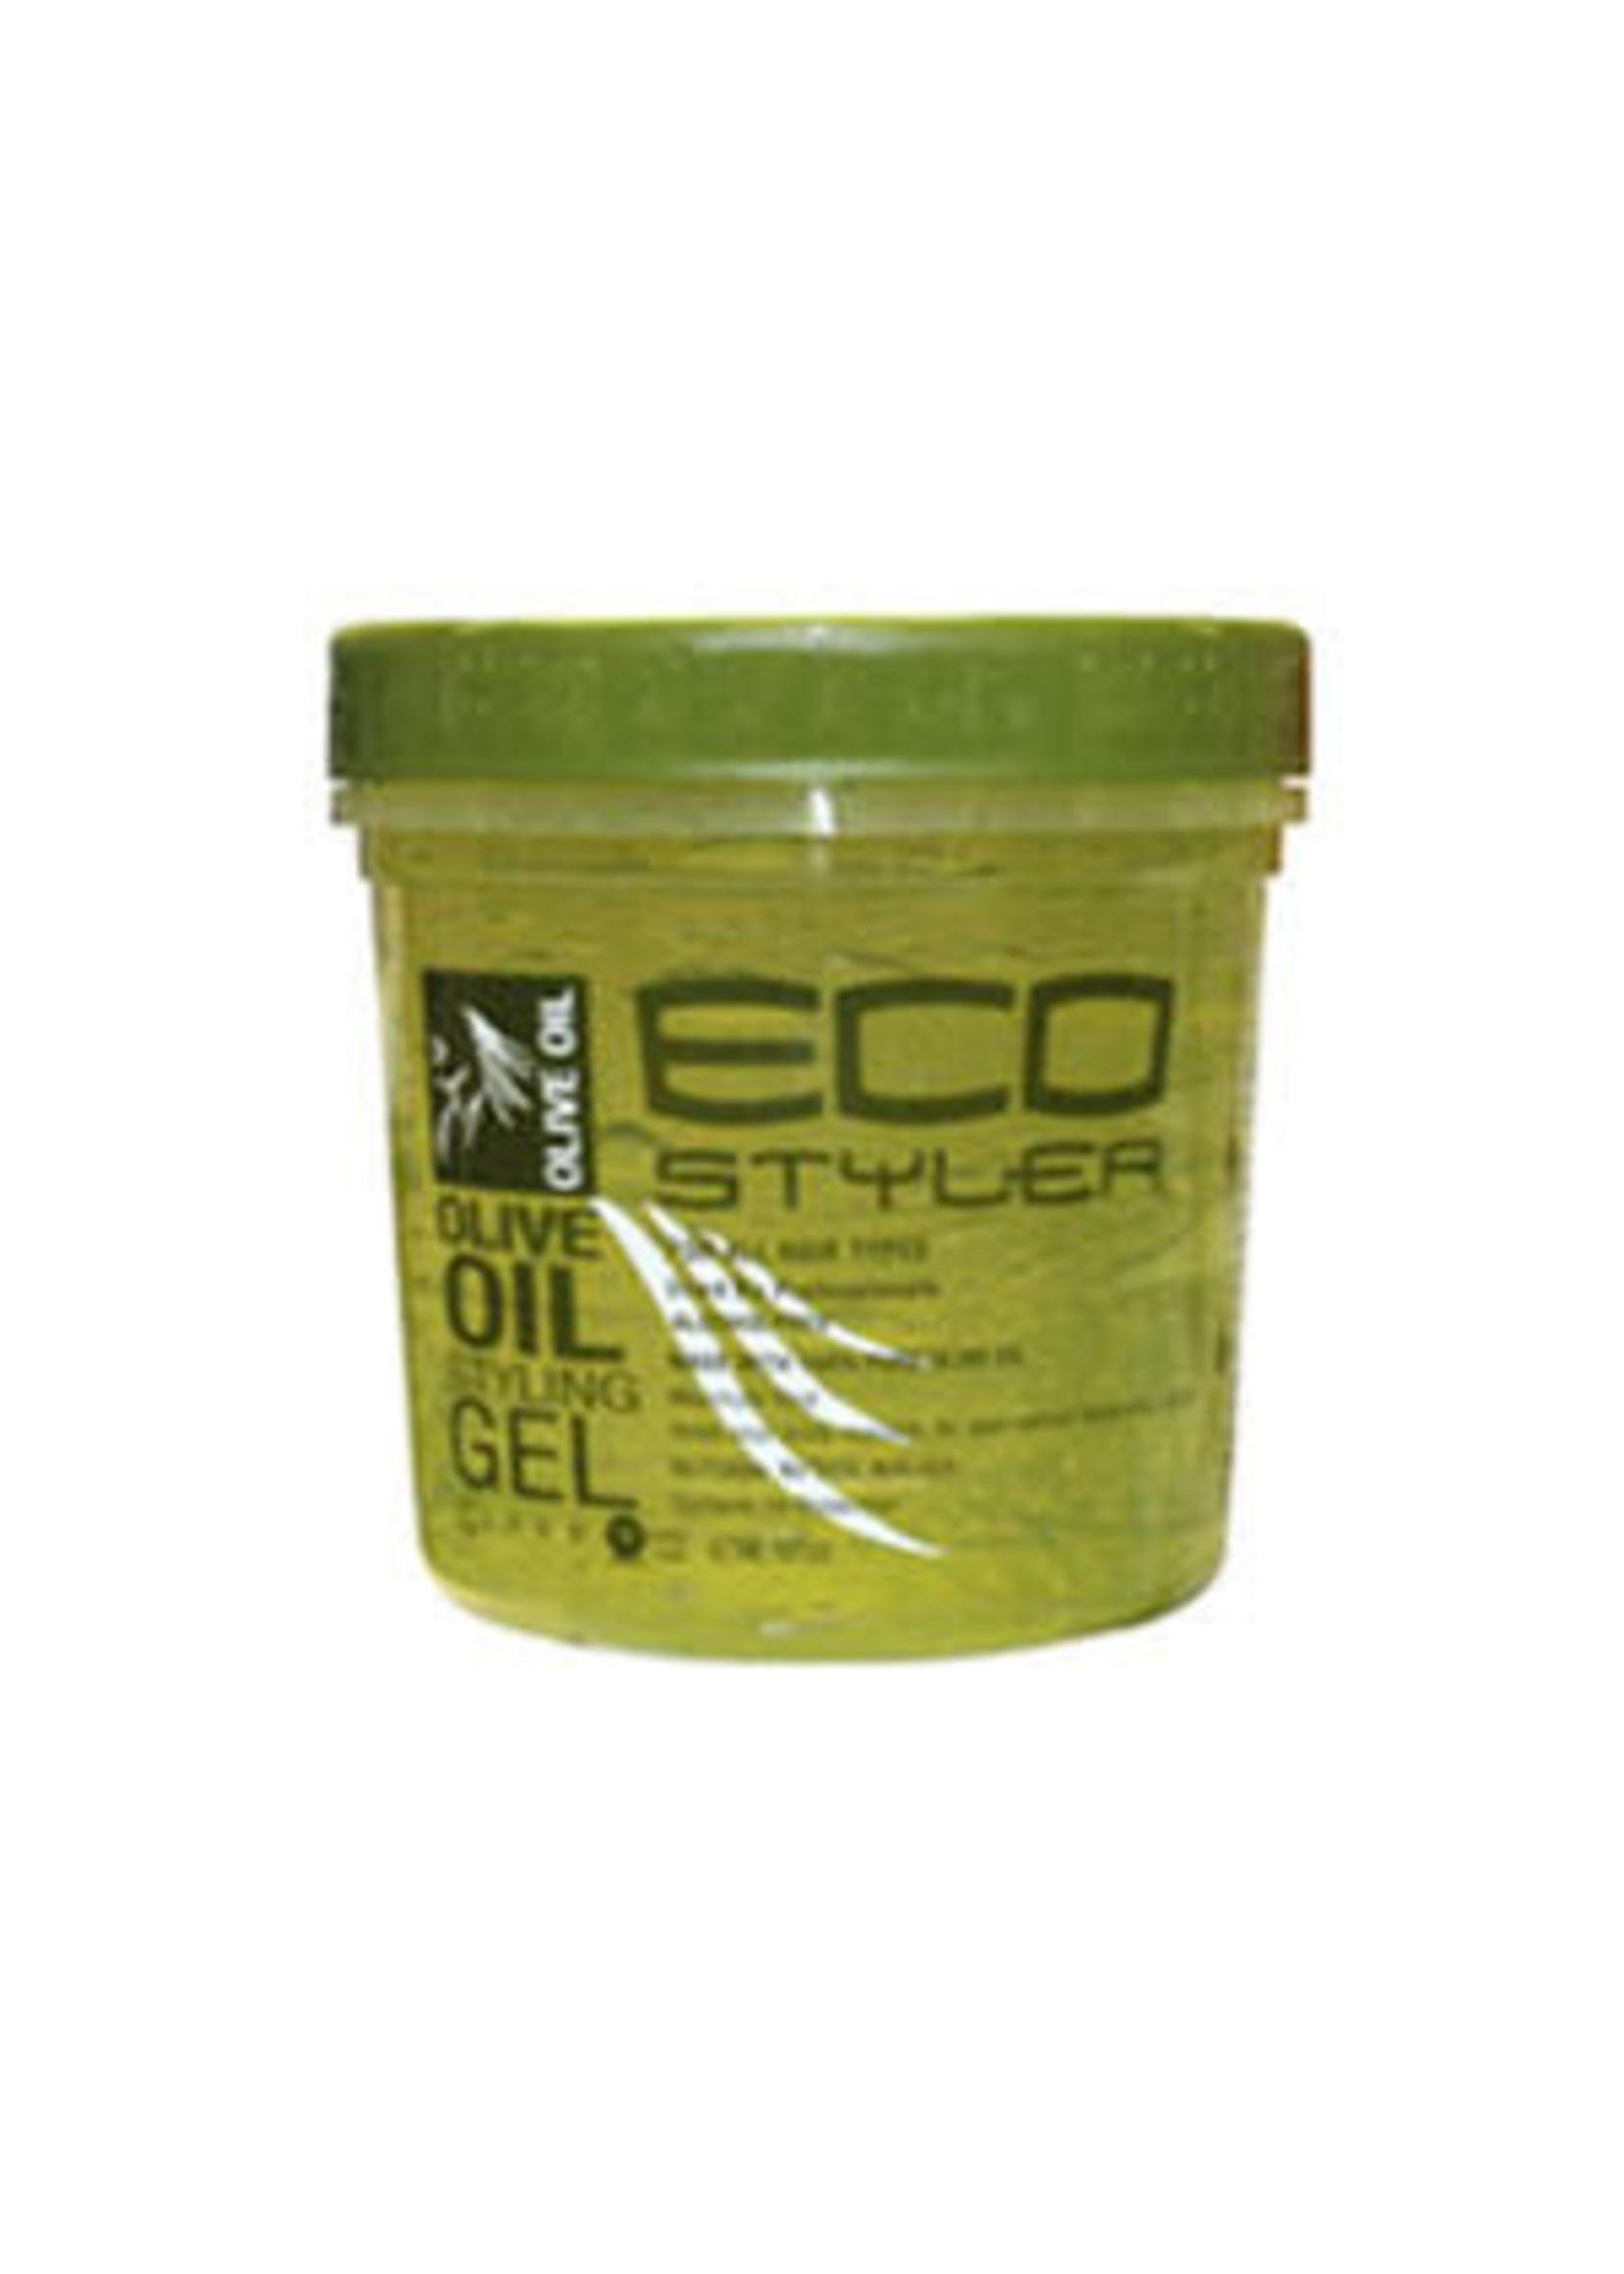 Eco Styling Gel Green [Olive Oil] 8oz.